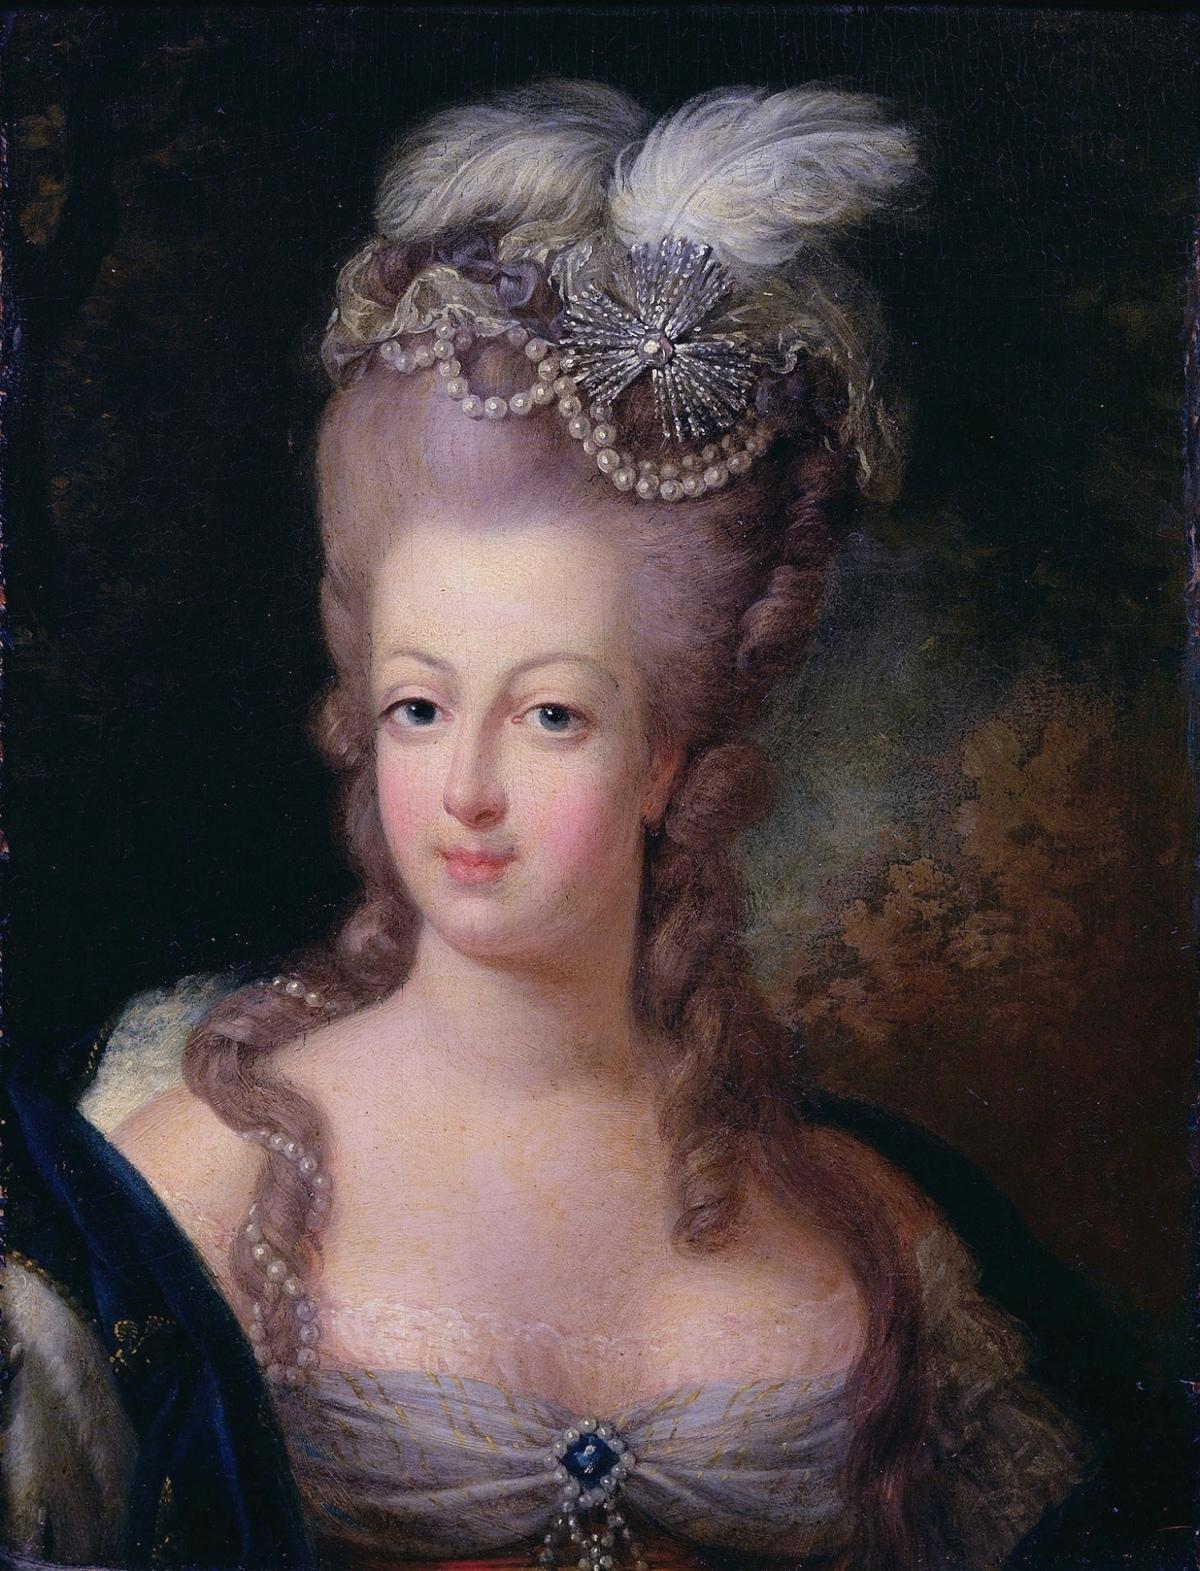 Marie Antoinette 1775 portrait